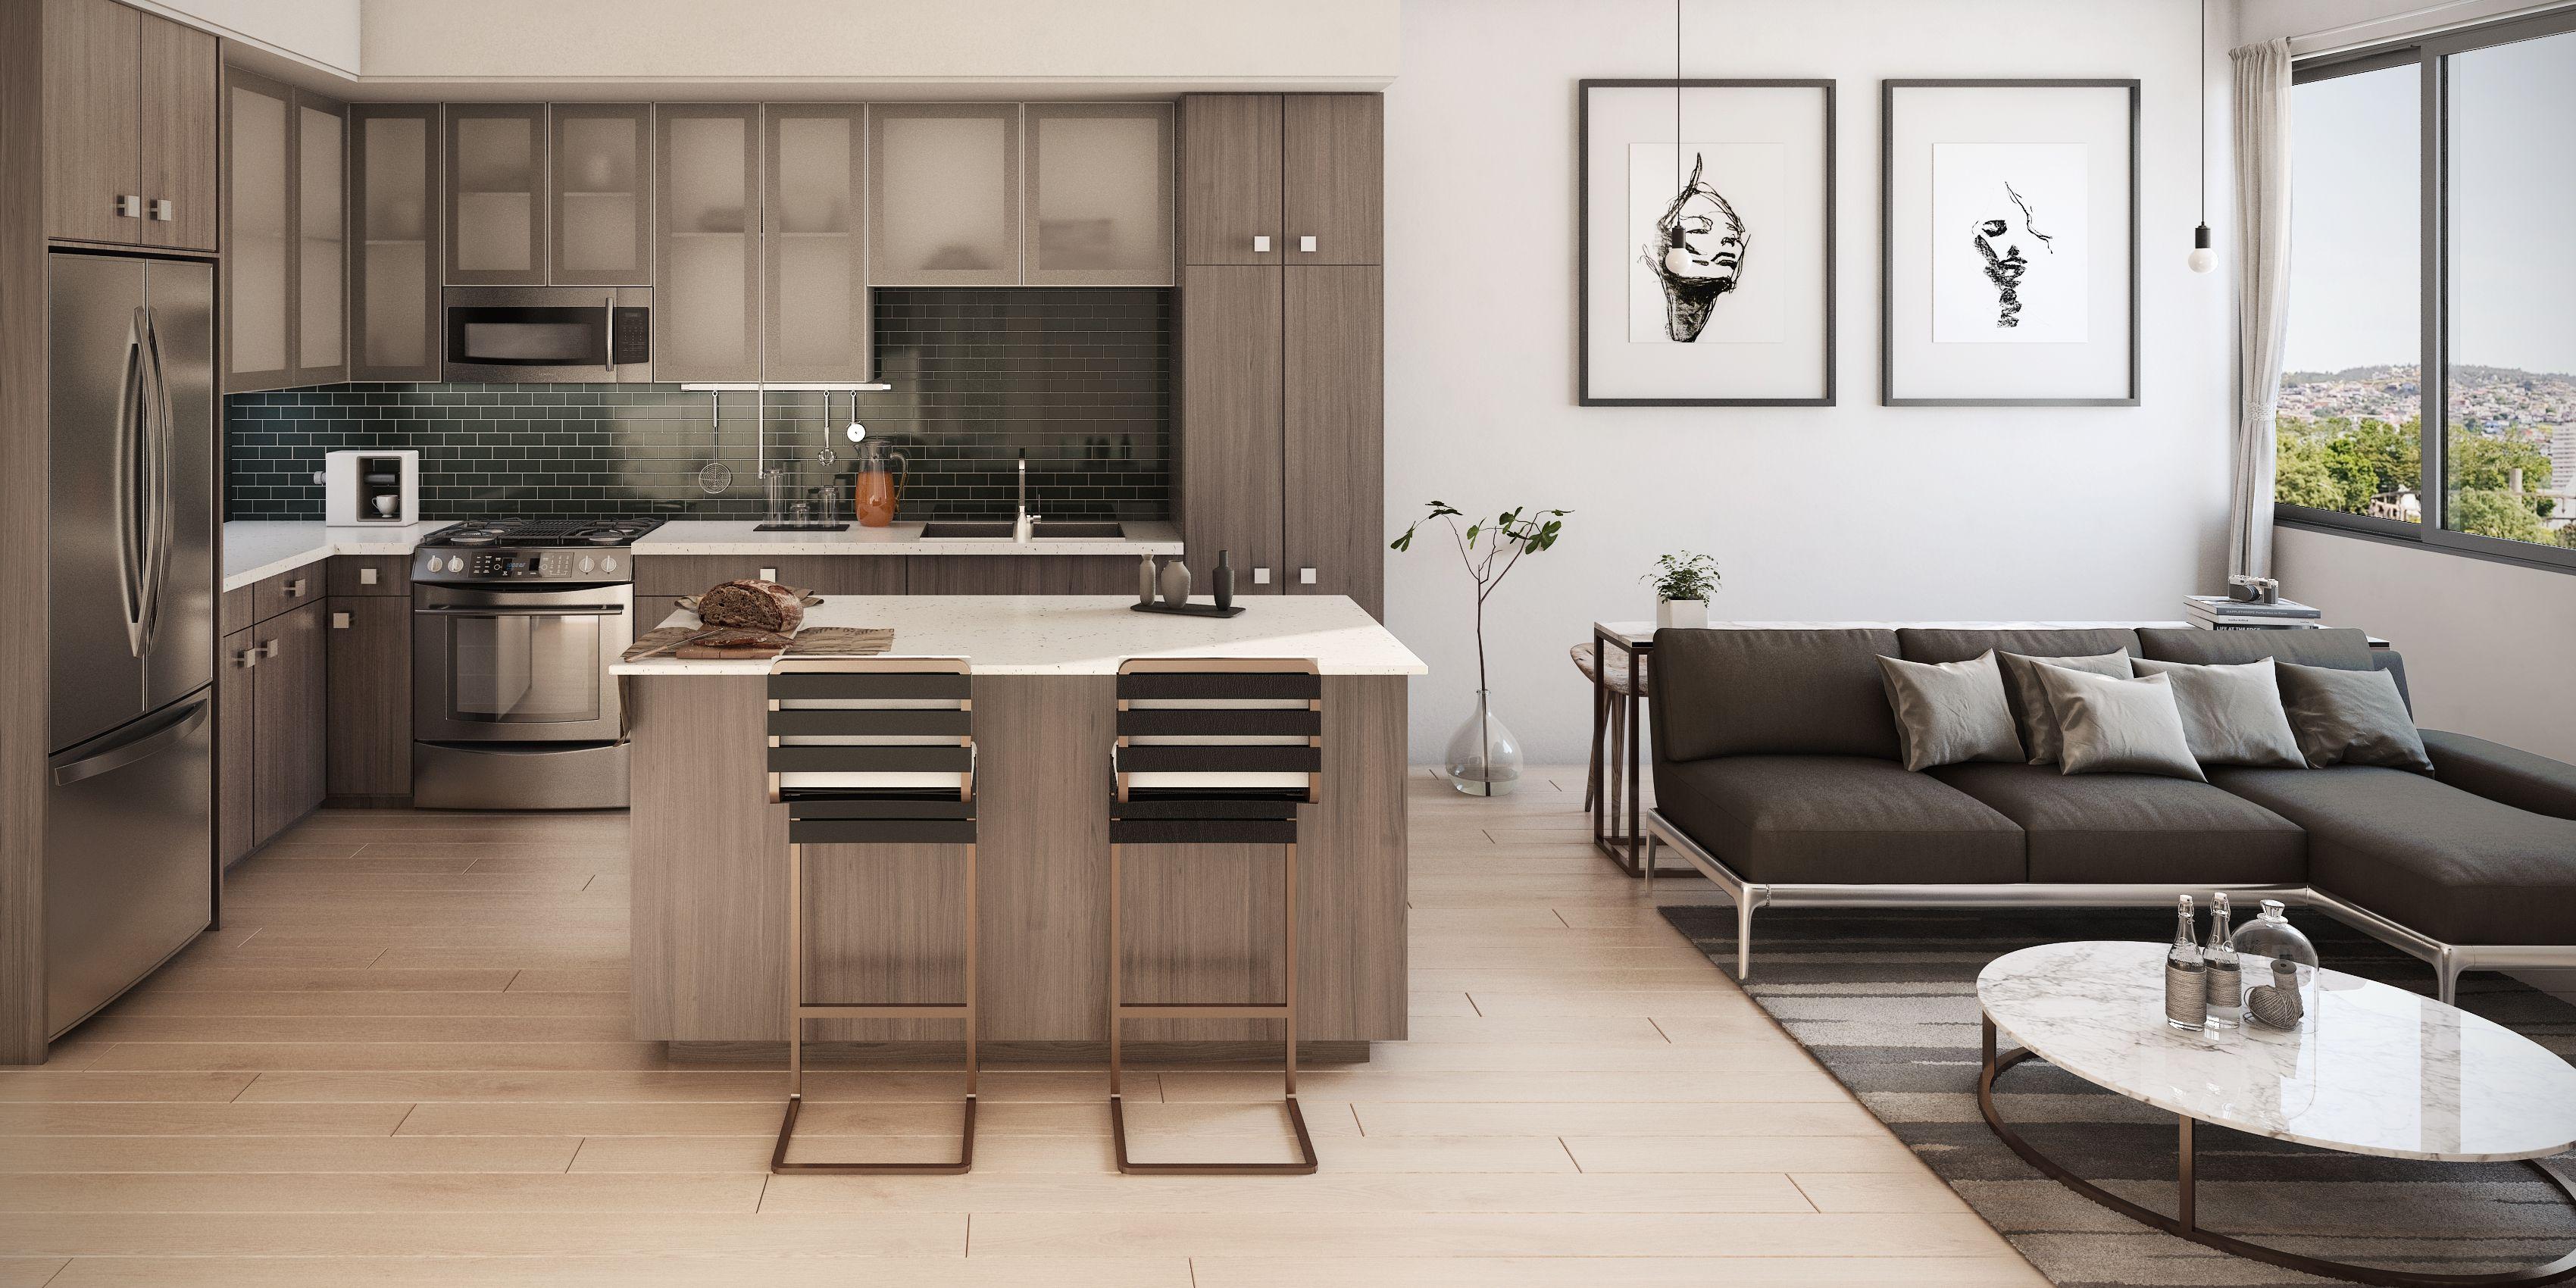 Kitchens At L Seven Apartments In San Francisco Ca Boast Quartz Countertops With Full Height